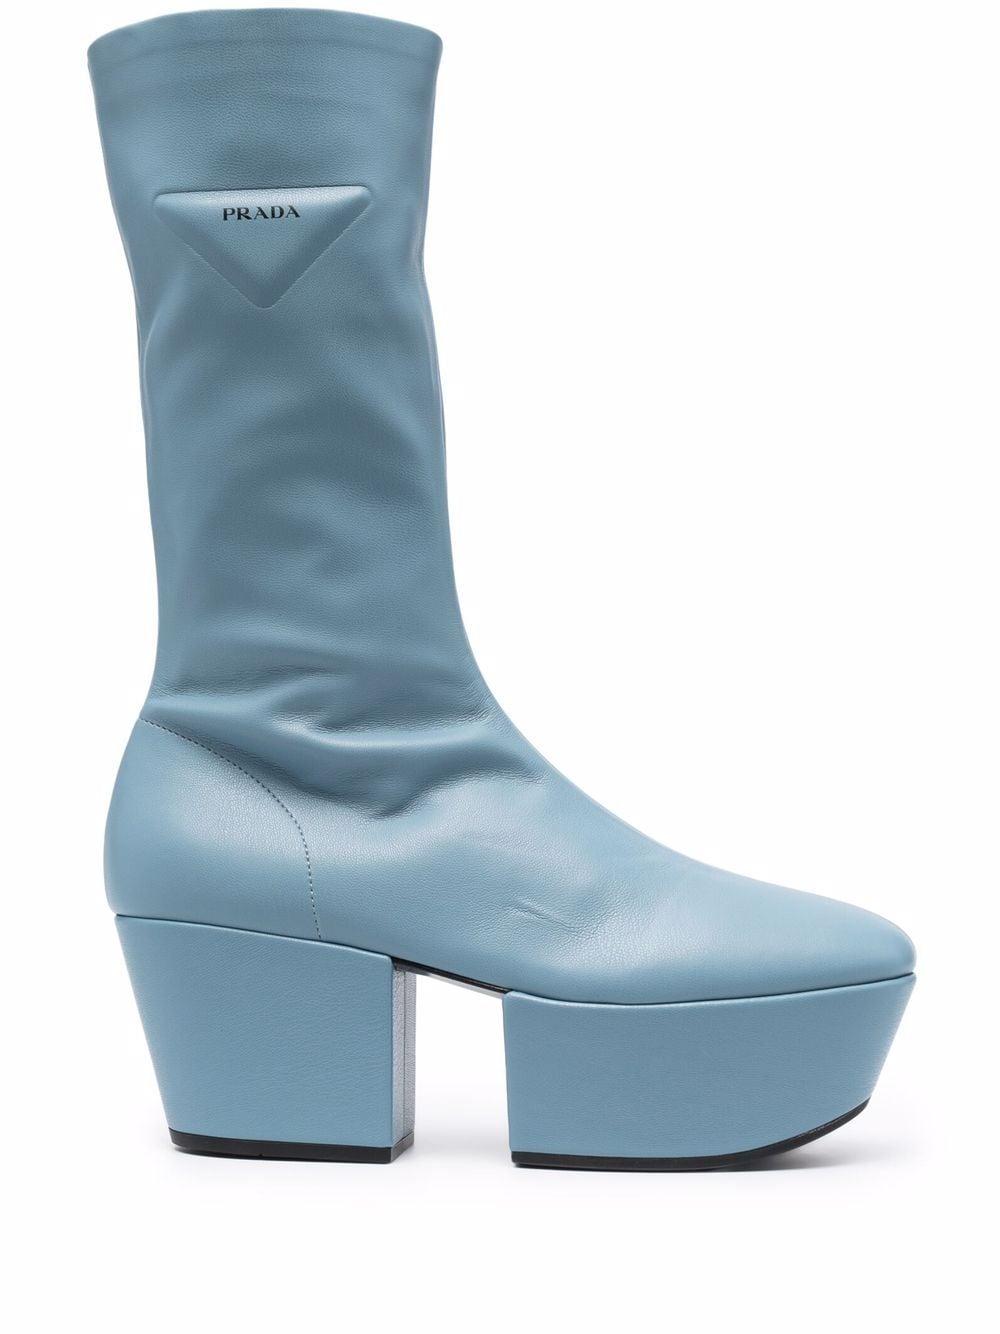 fall essentials items - prada chunky boots in blue